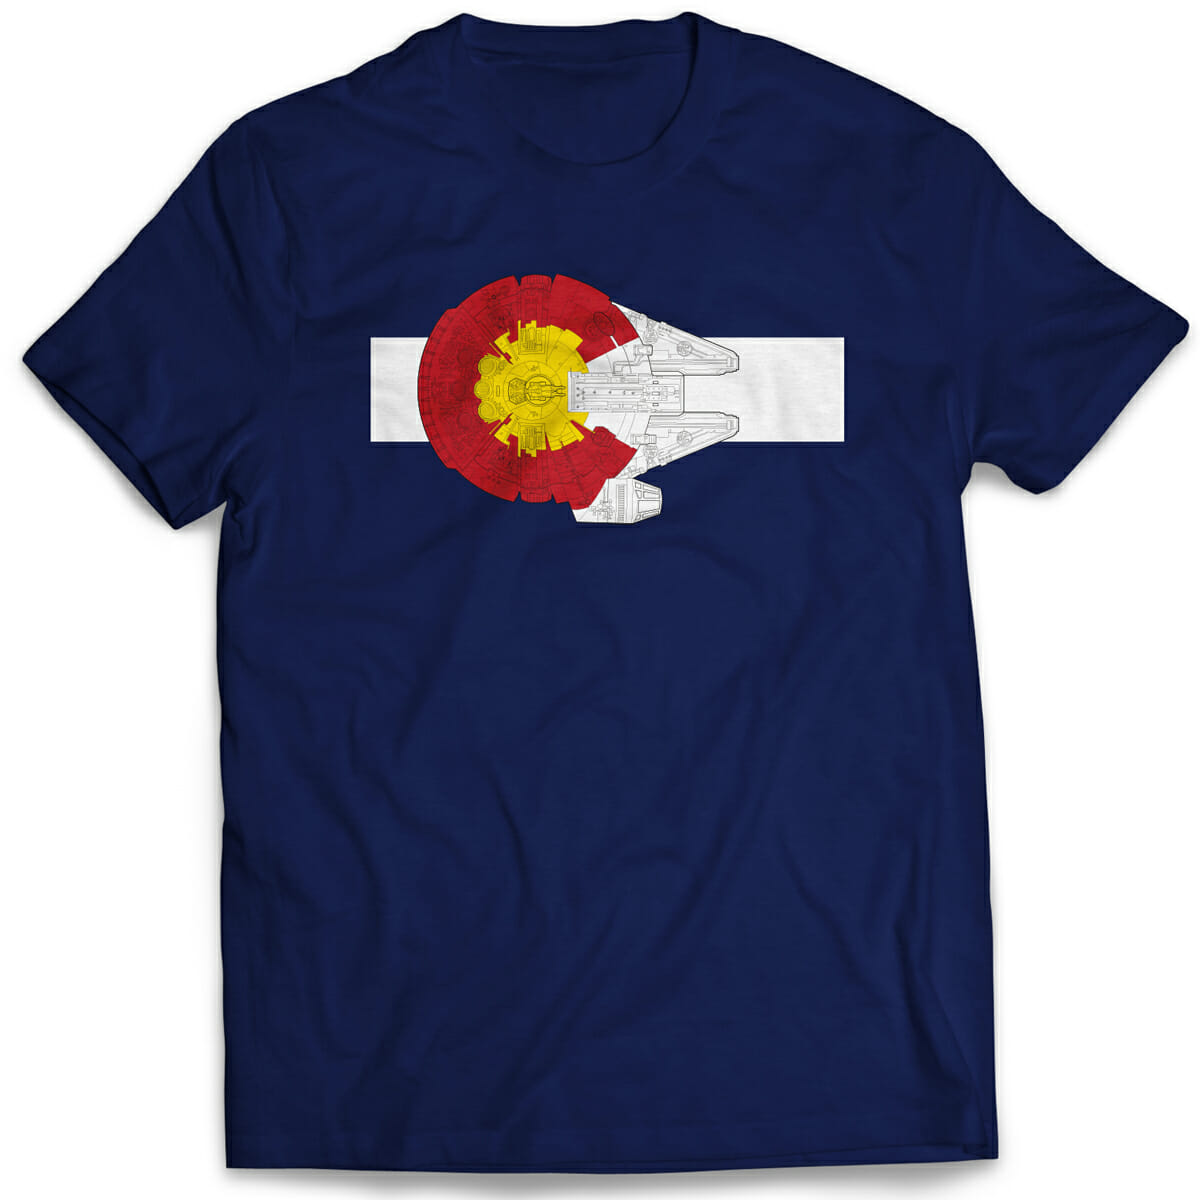 0a5f10092 Colorado Millennium Falcon | Star Wars | High Altitude Apparel